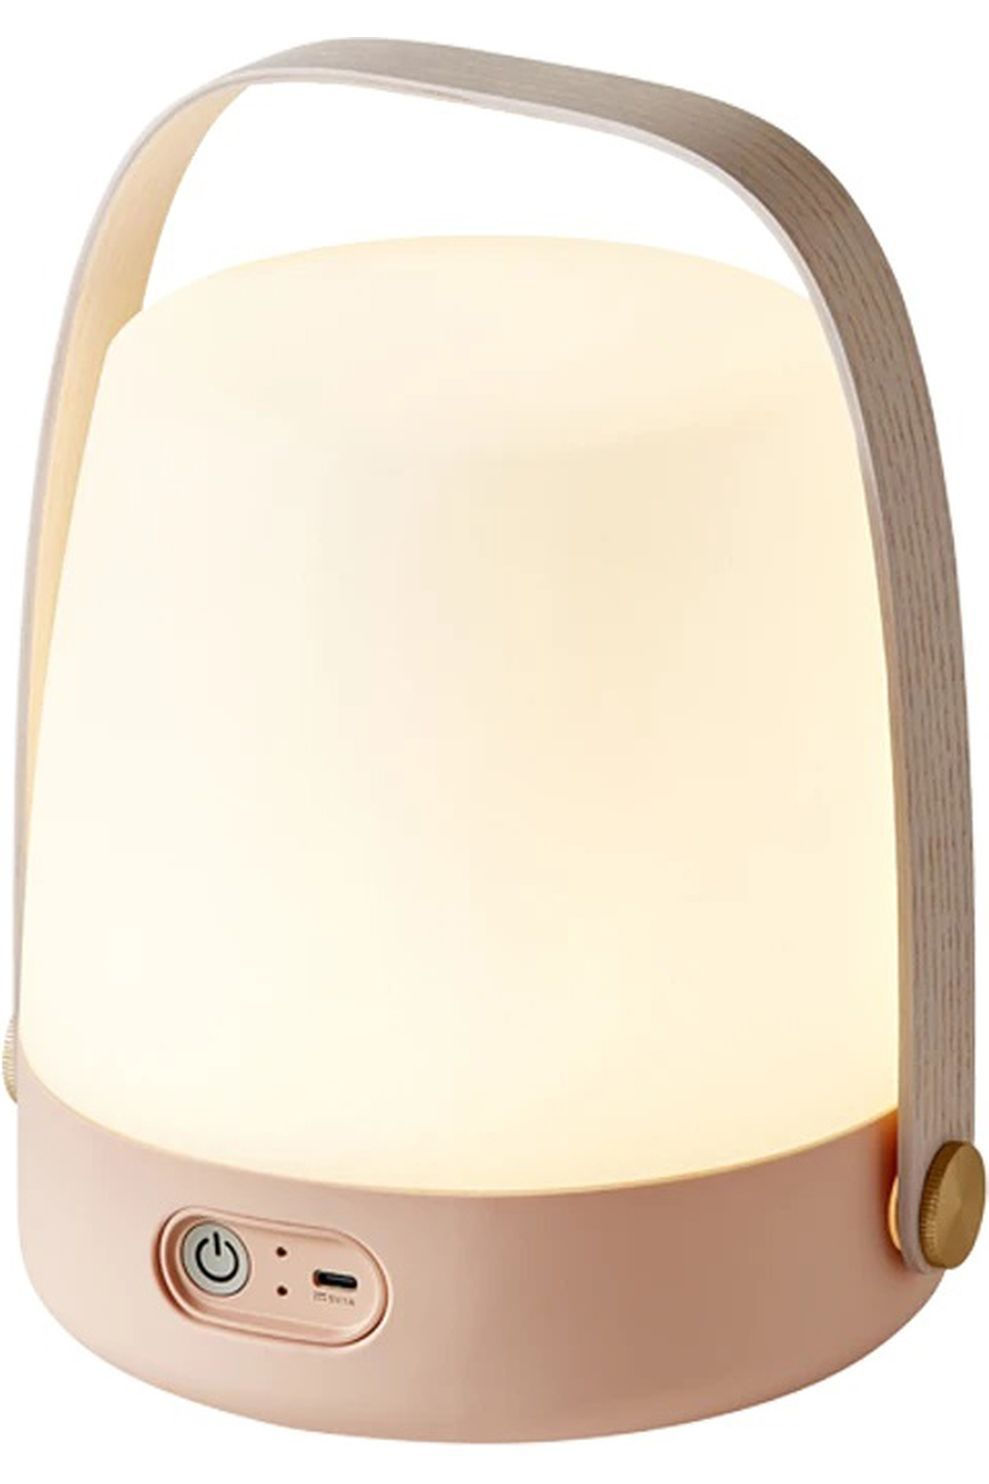 Kooduu Staanlamp Lite-Up - Wit/Roze